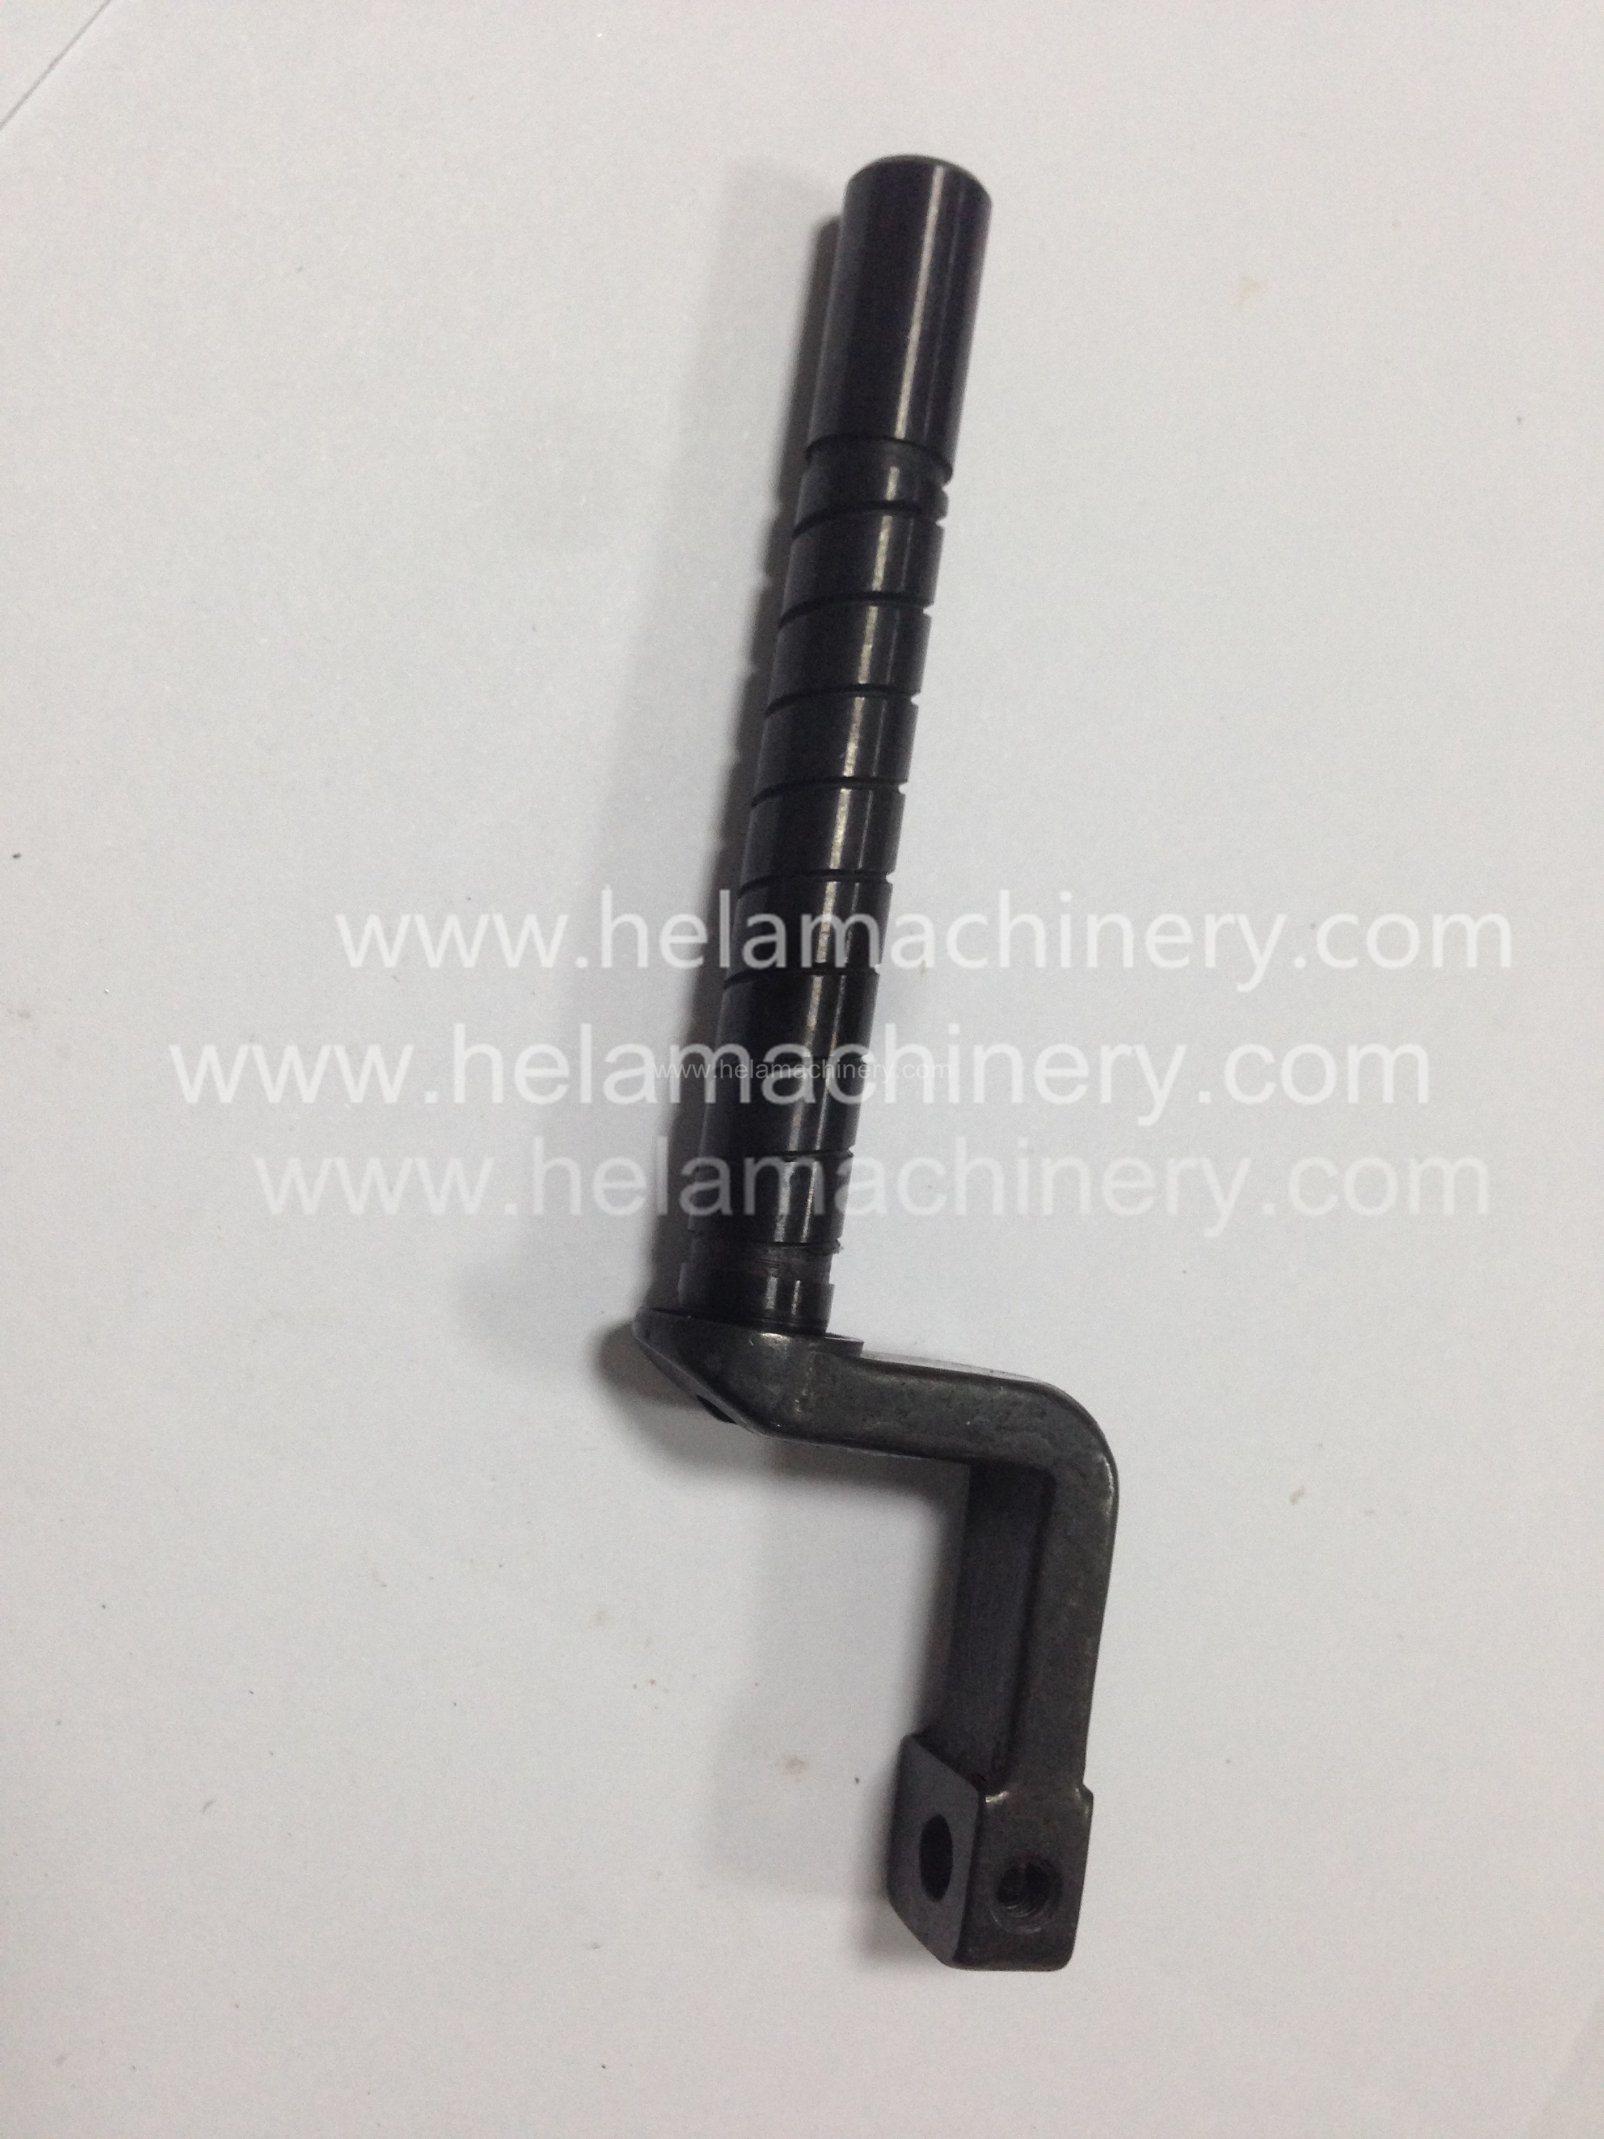 Sunstar Parts Sewing Machine Parts High Precision Parts Original Genuine